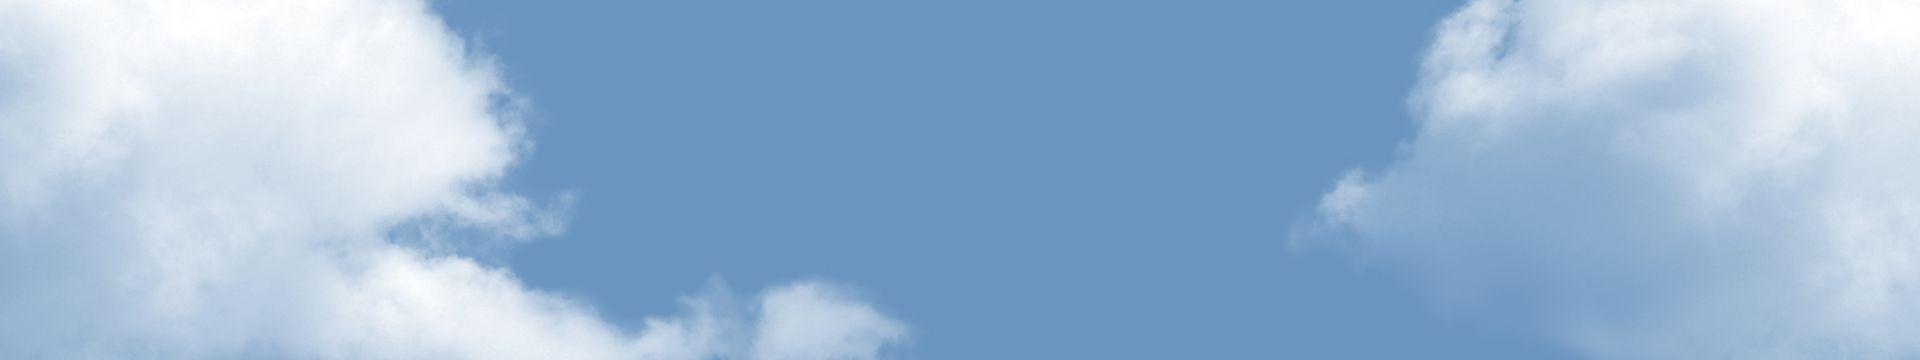 HeroSmall_Clouds